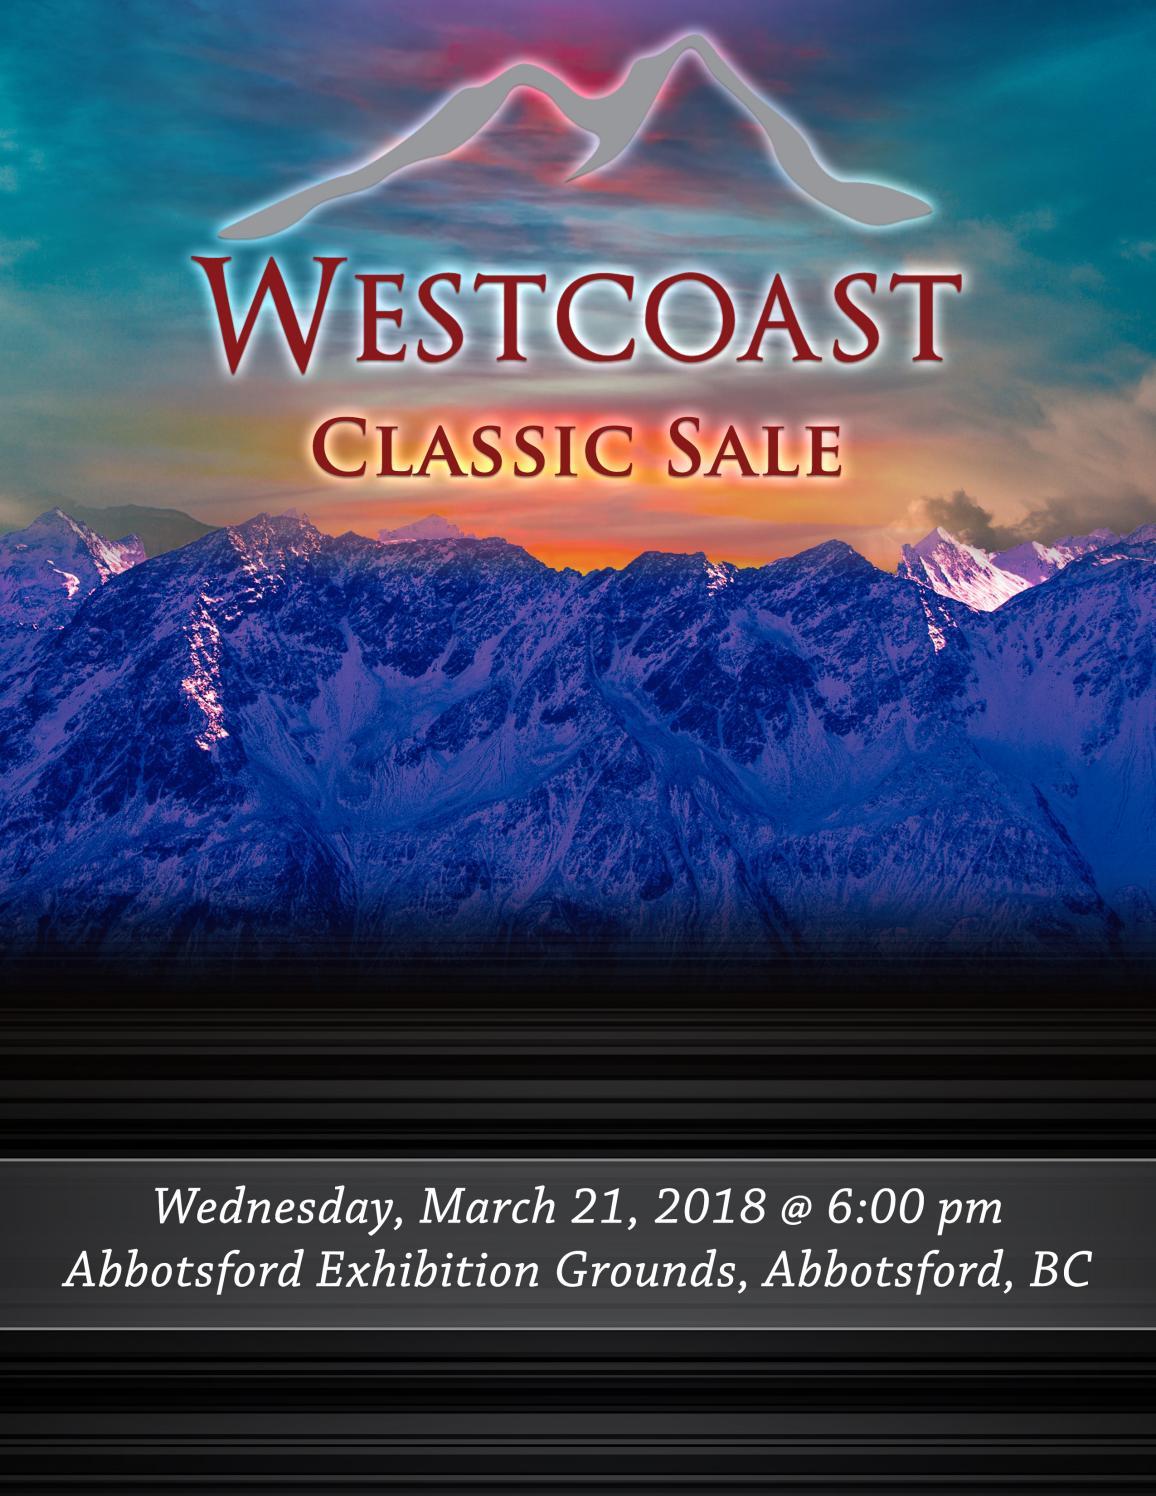 Westcoast Classic Sale 2018 by Cowsmopolitan - issuu